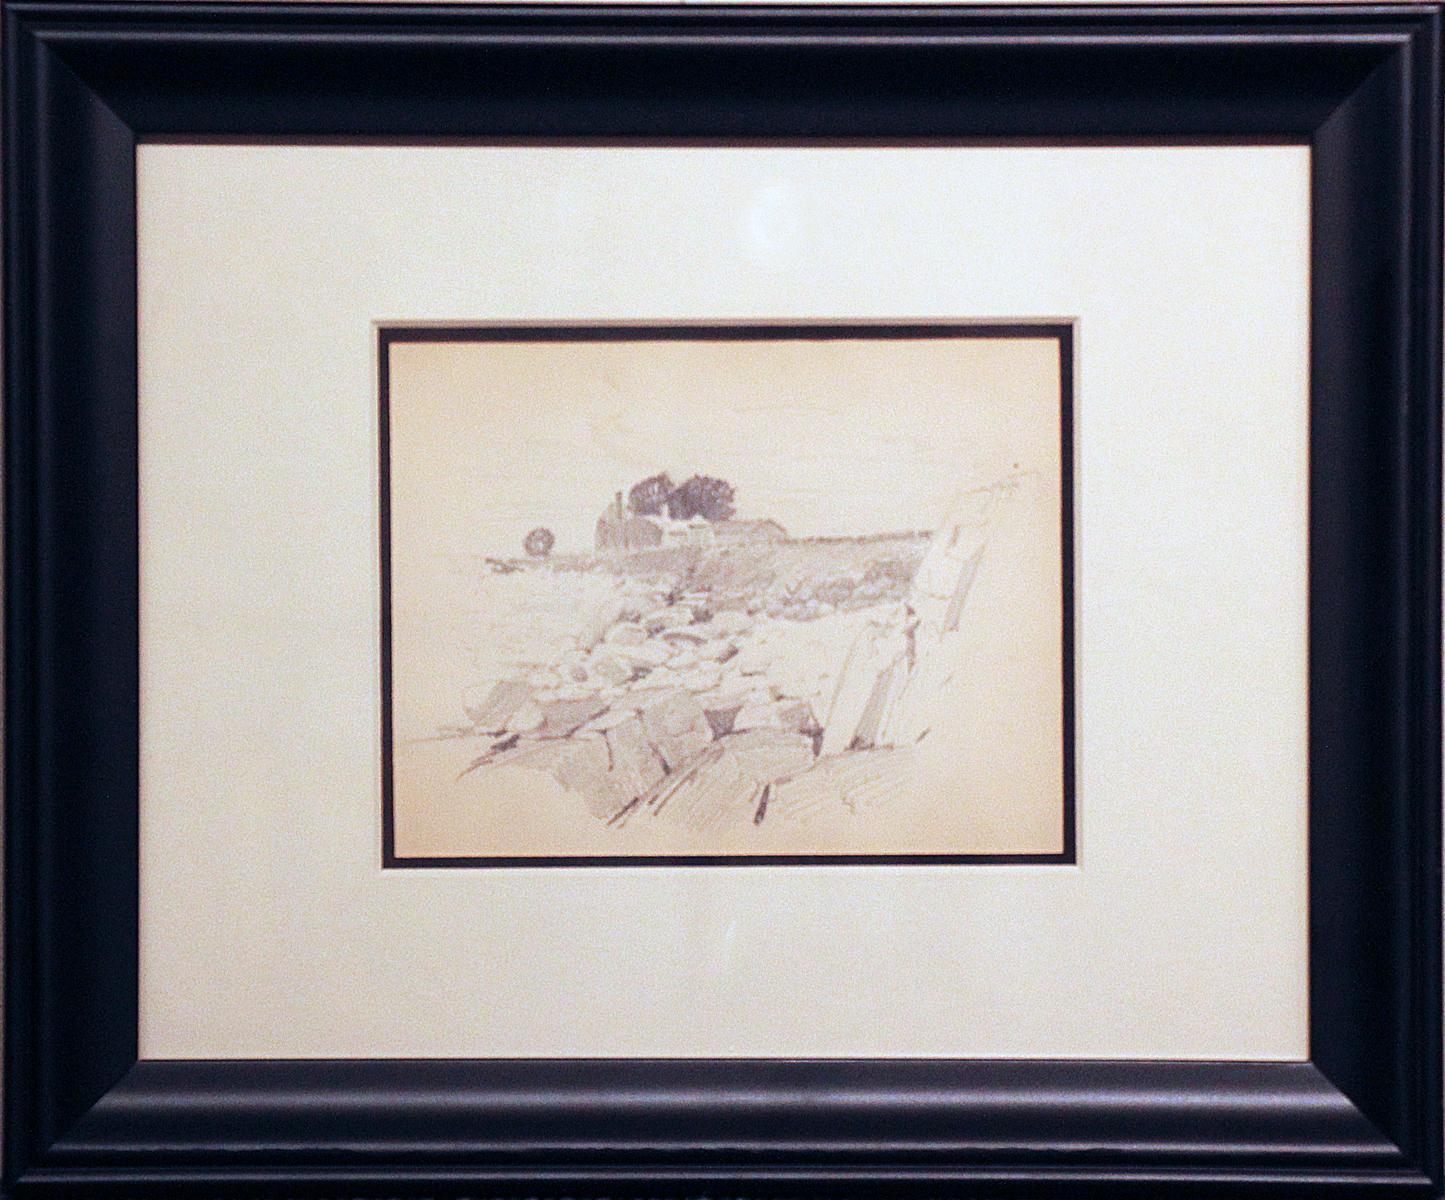 Rocks and Farmhouse, American Impressionist, Miniature Pencil Drawing, 1899